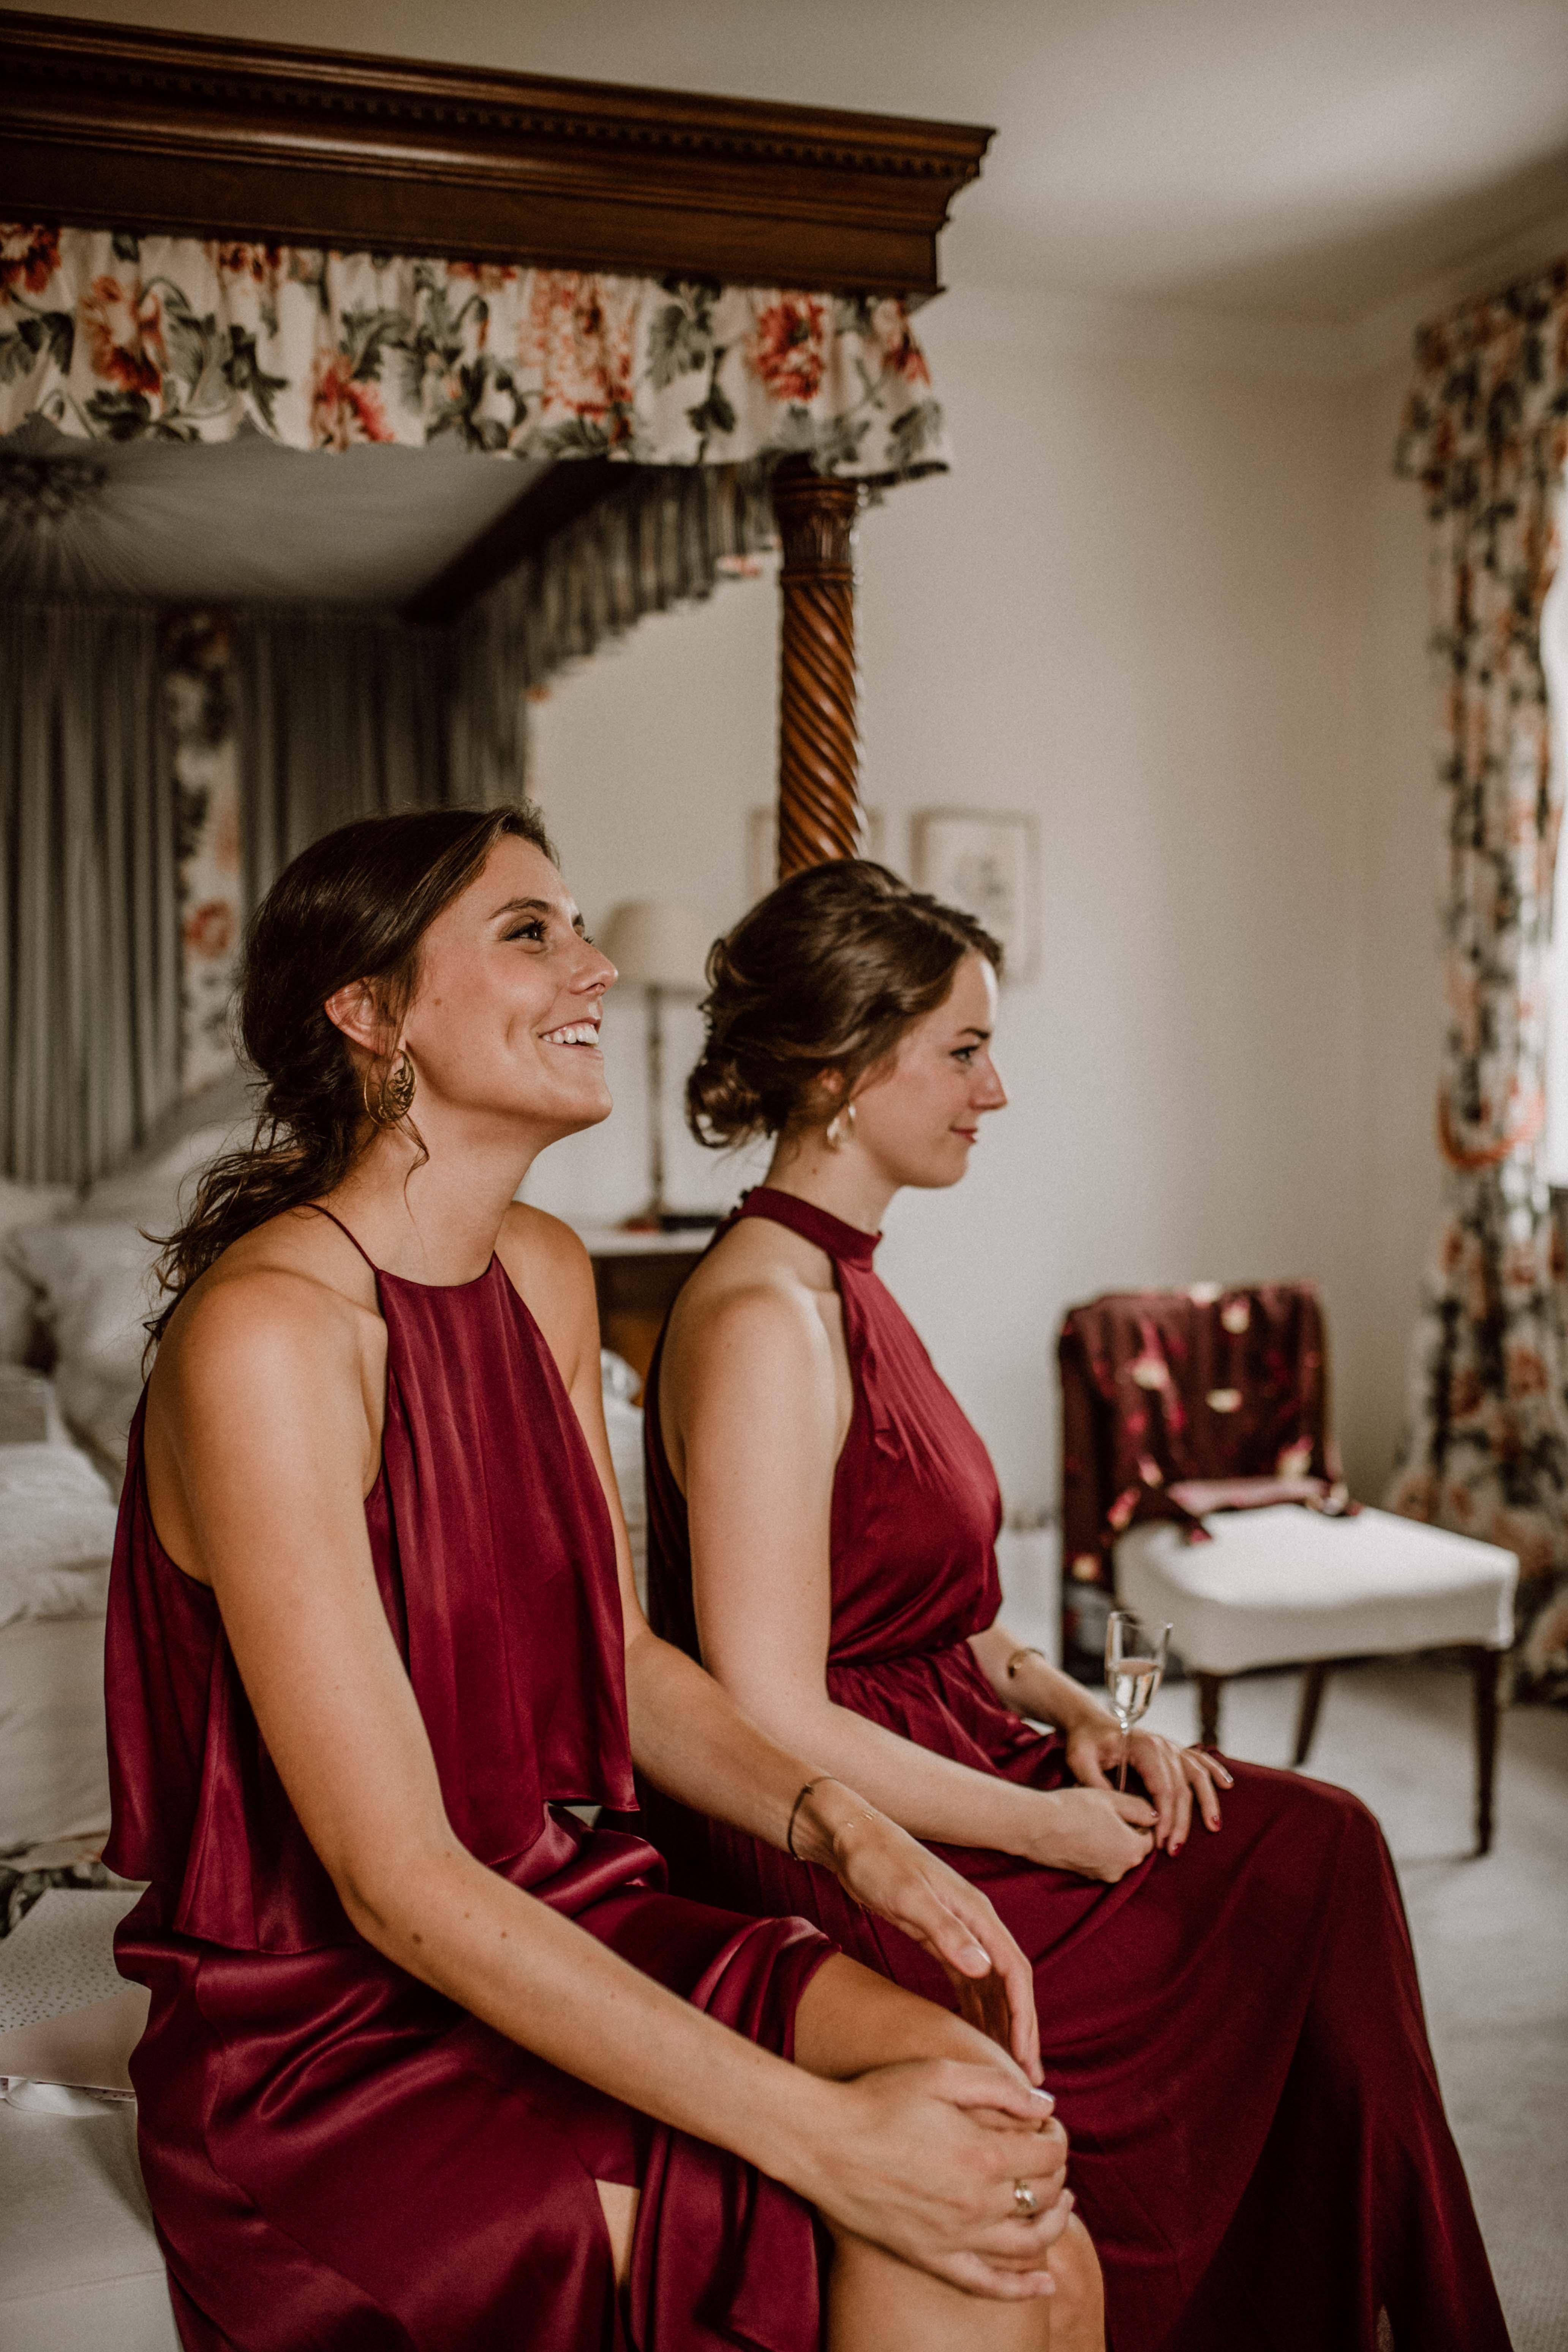 girlpower mädels sonja poehlmann photography couples muenchen bayern